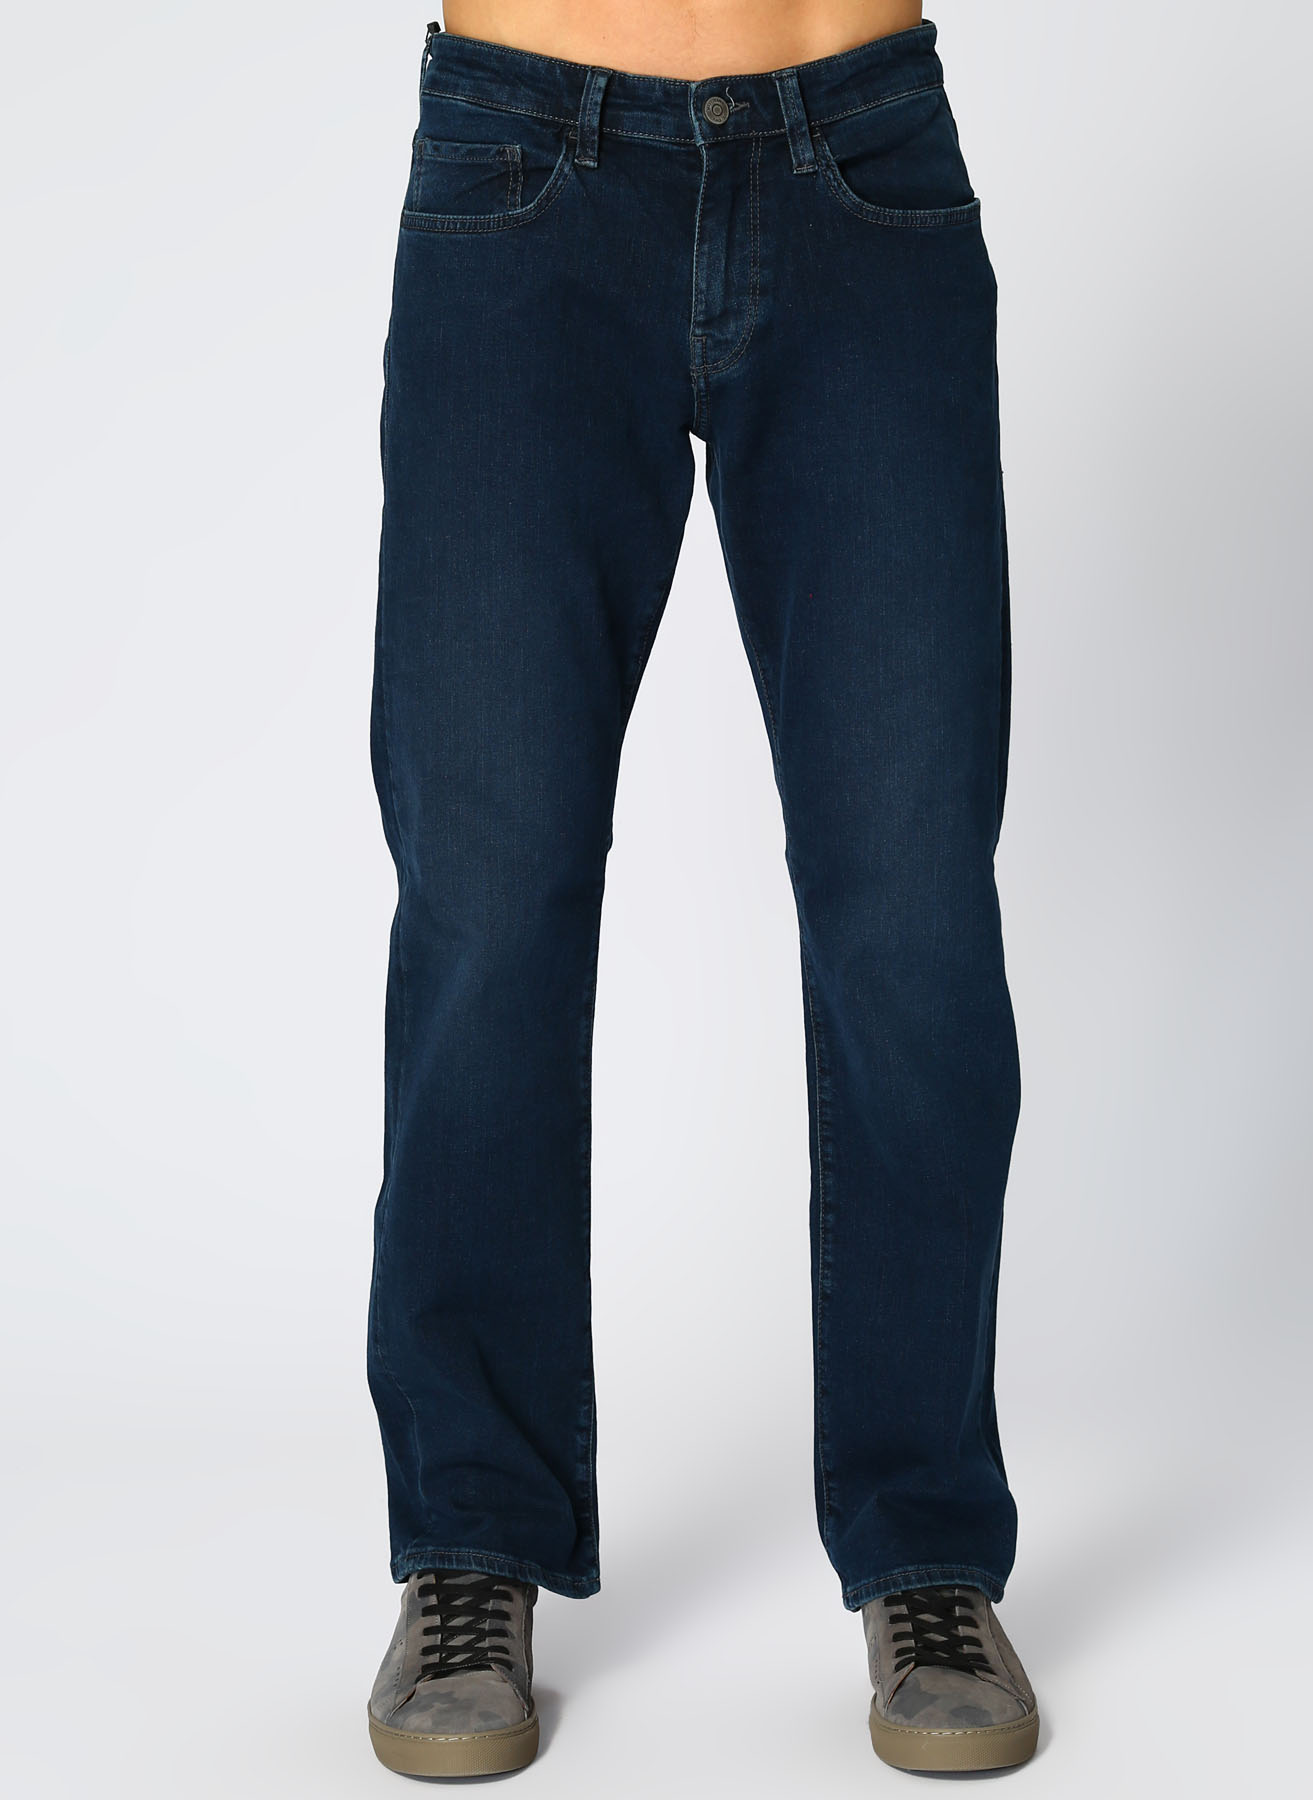 Mavi Klasik Pantolon 34-32 5001634311023 Ürün Resmi